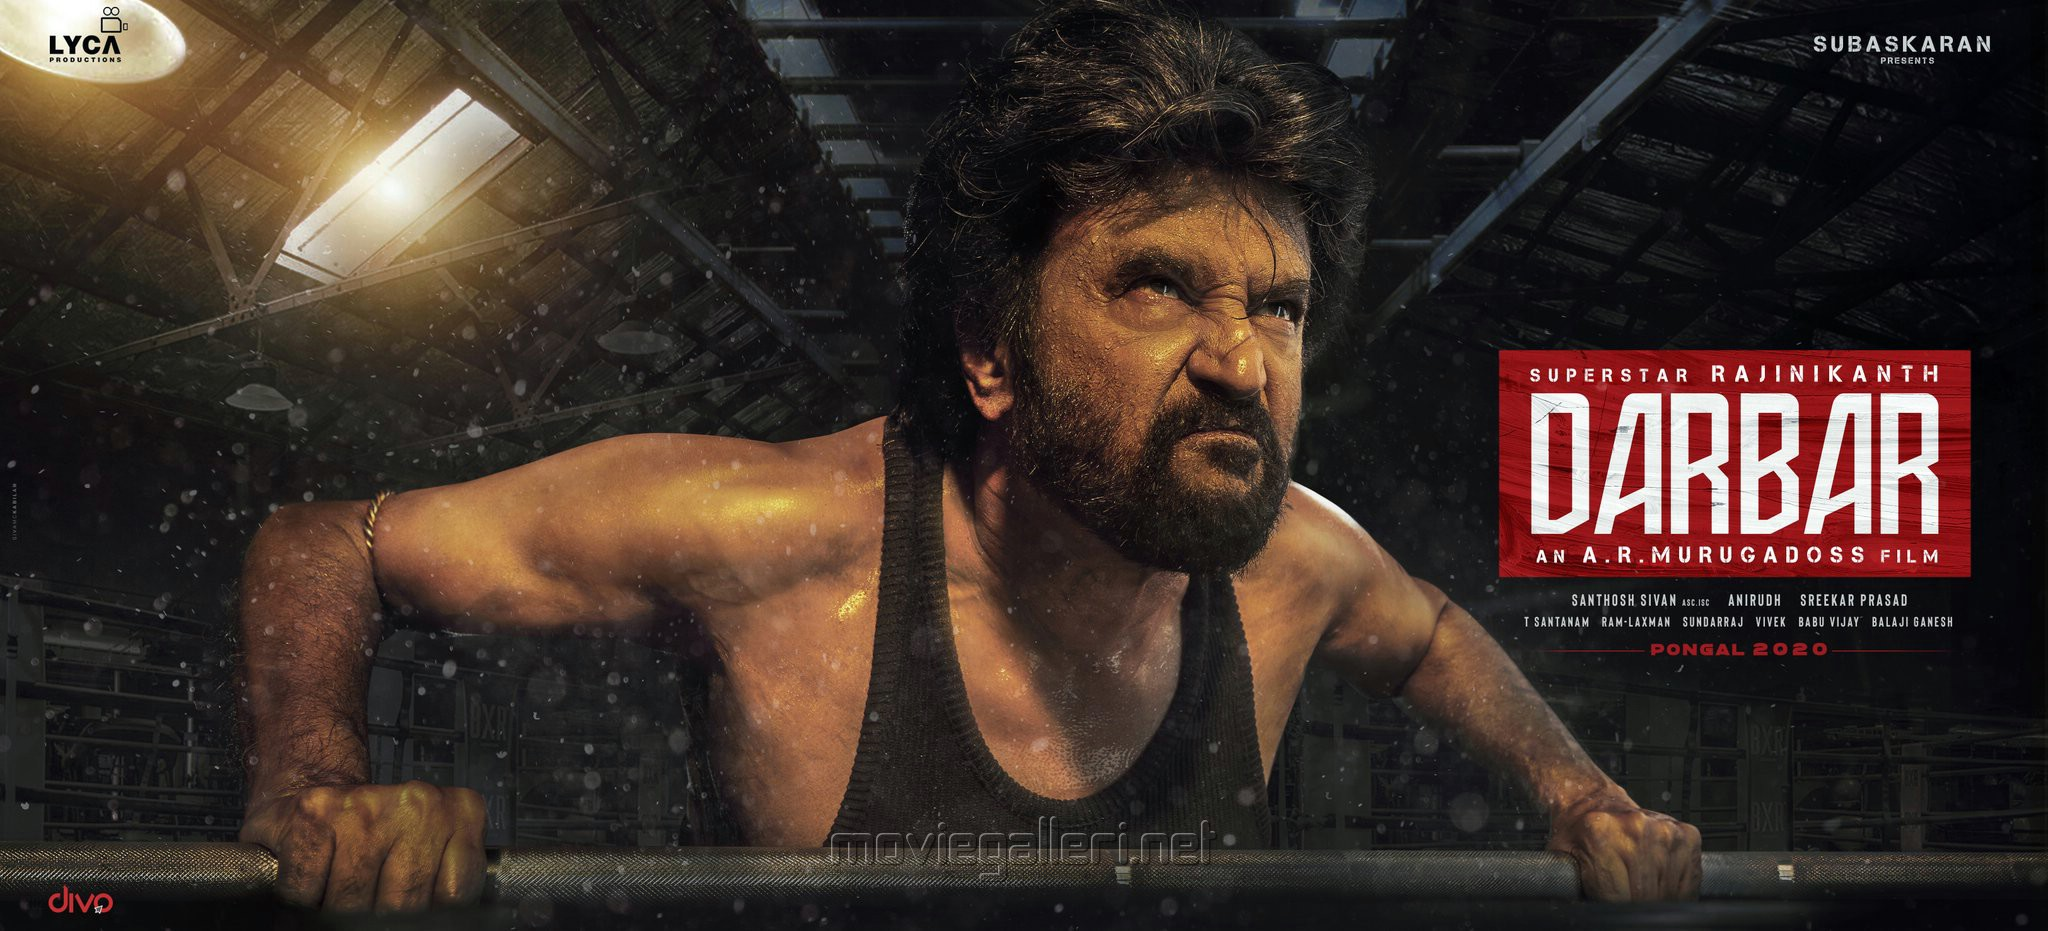 Superstar Rajinikanth Darbar Second Look Poster HD